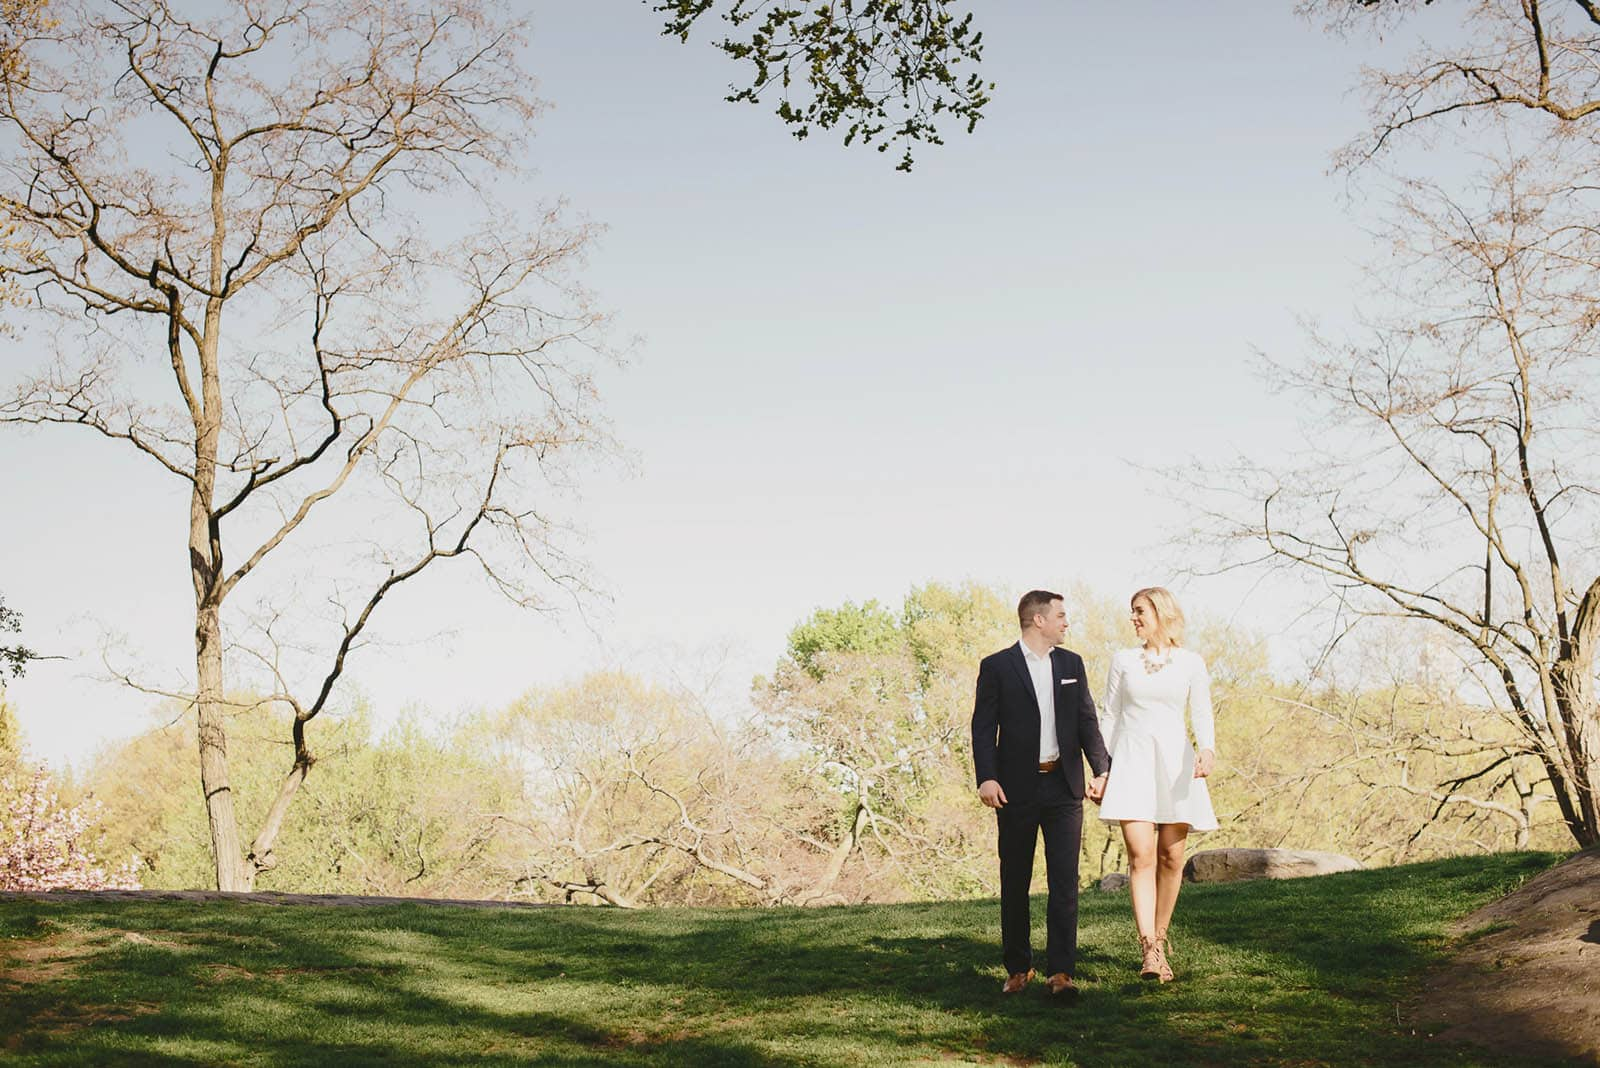 Central Park Elegant Engagement Outfits